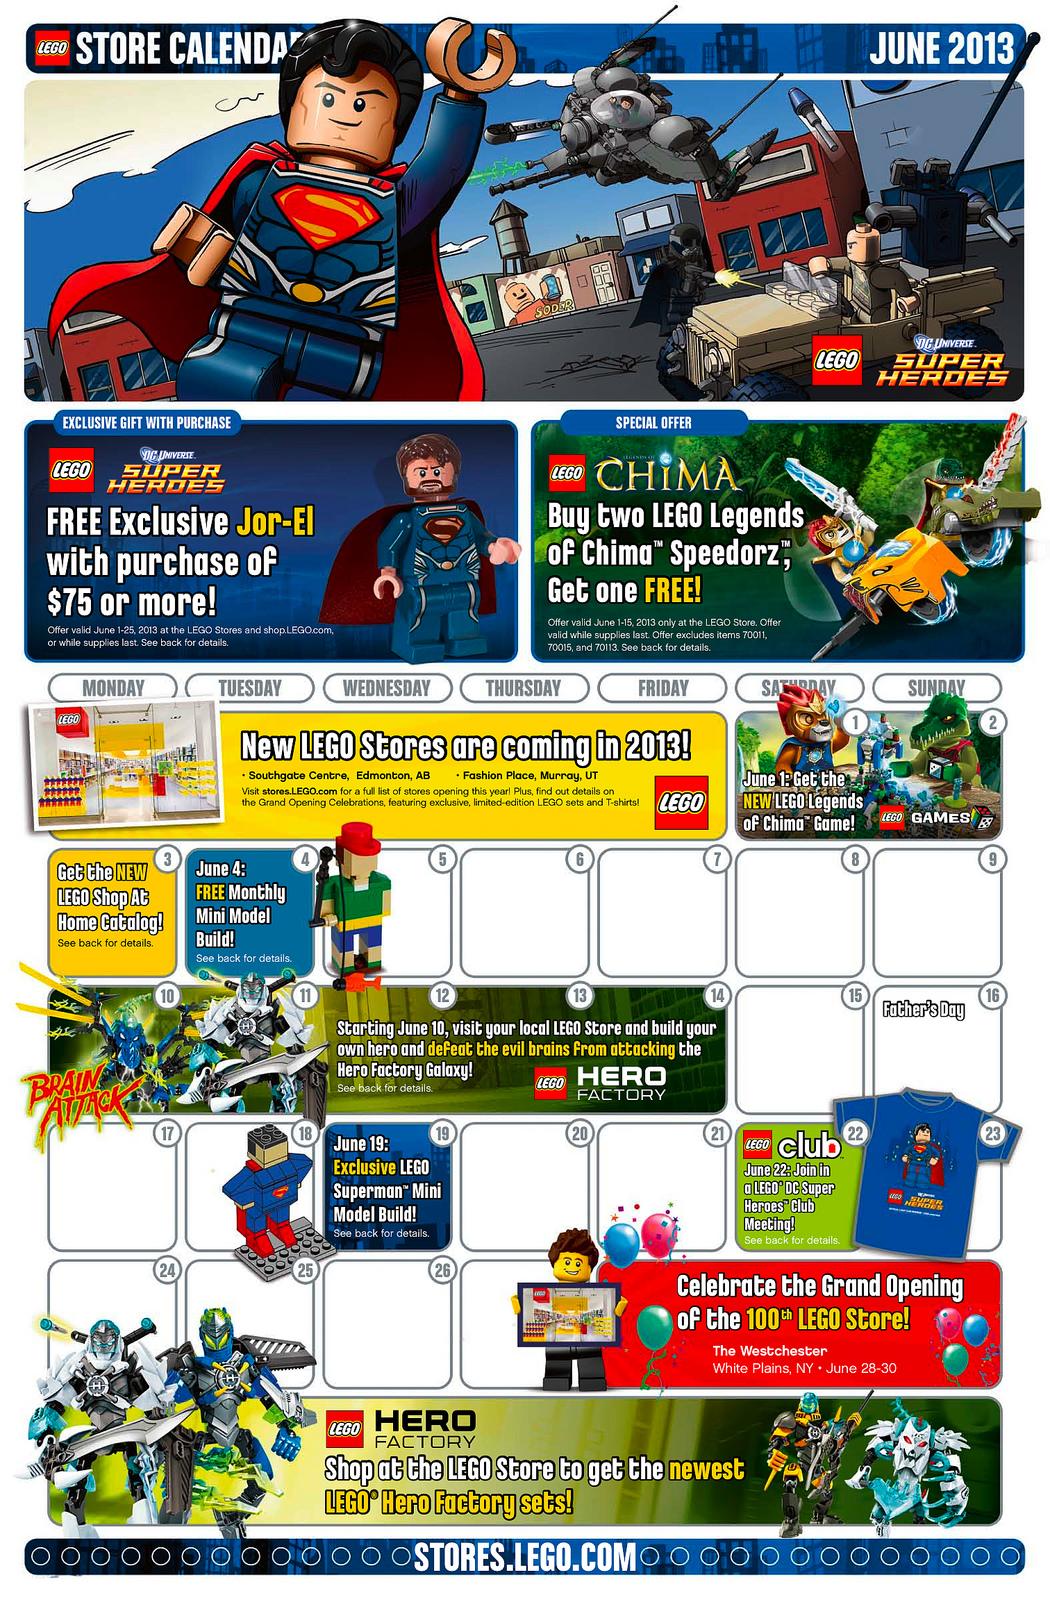 Calendar Lego June : June lego store calendar free jor el minifigure promo